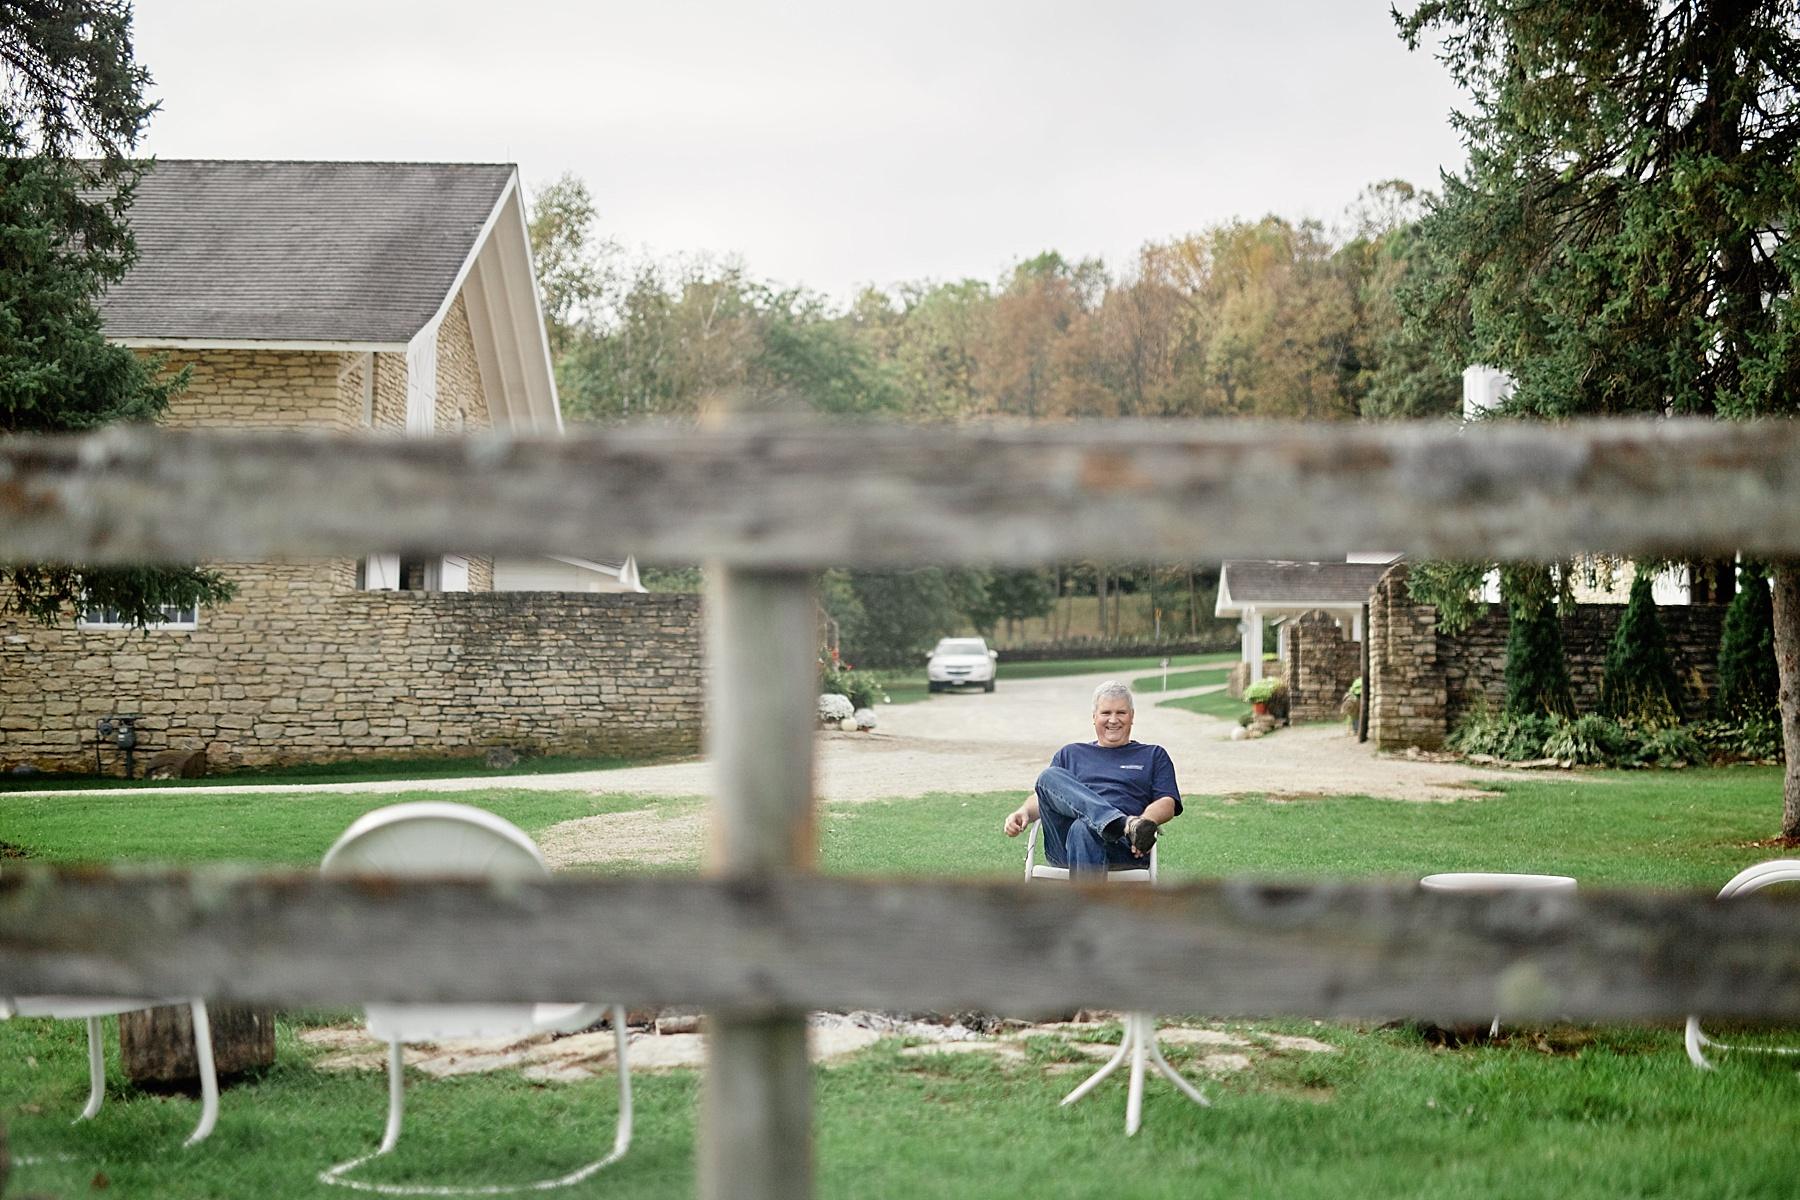 Maywood-Stone-Barn-Wedding-Rochester-Minnesota-Perry-James-Photo_0546.jpg